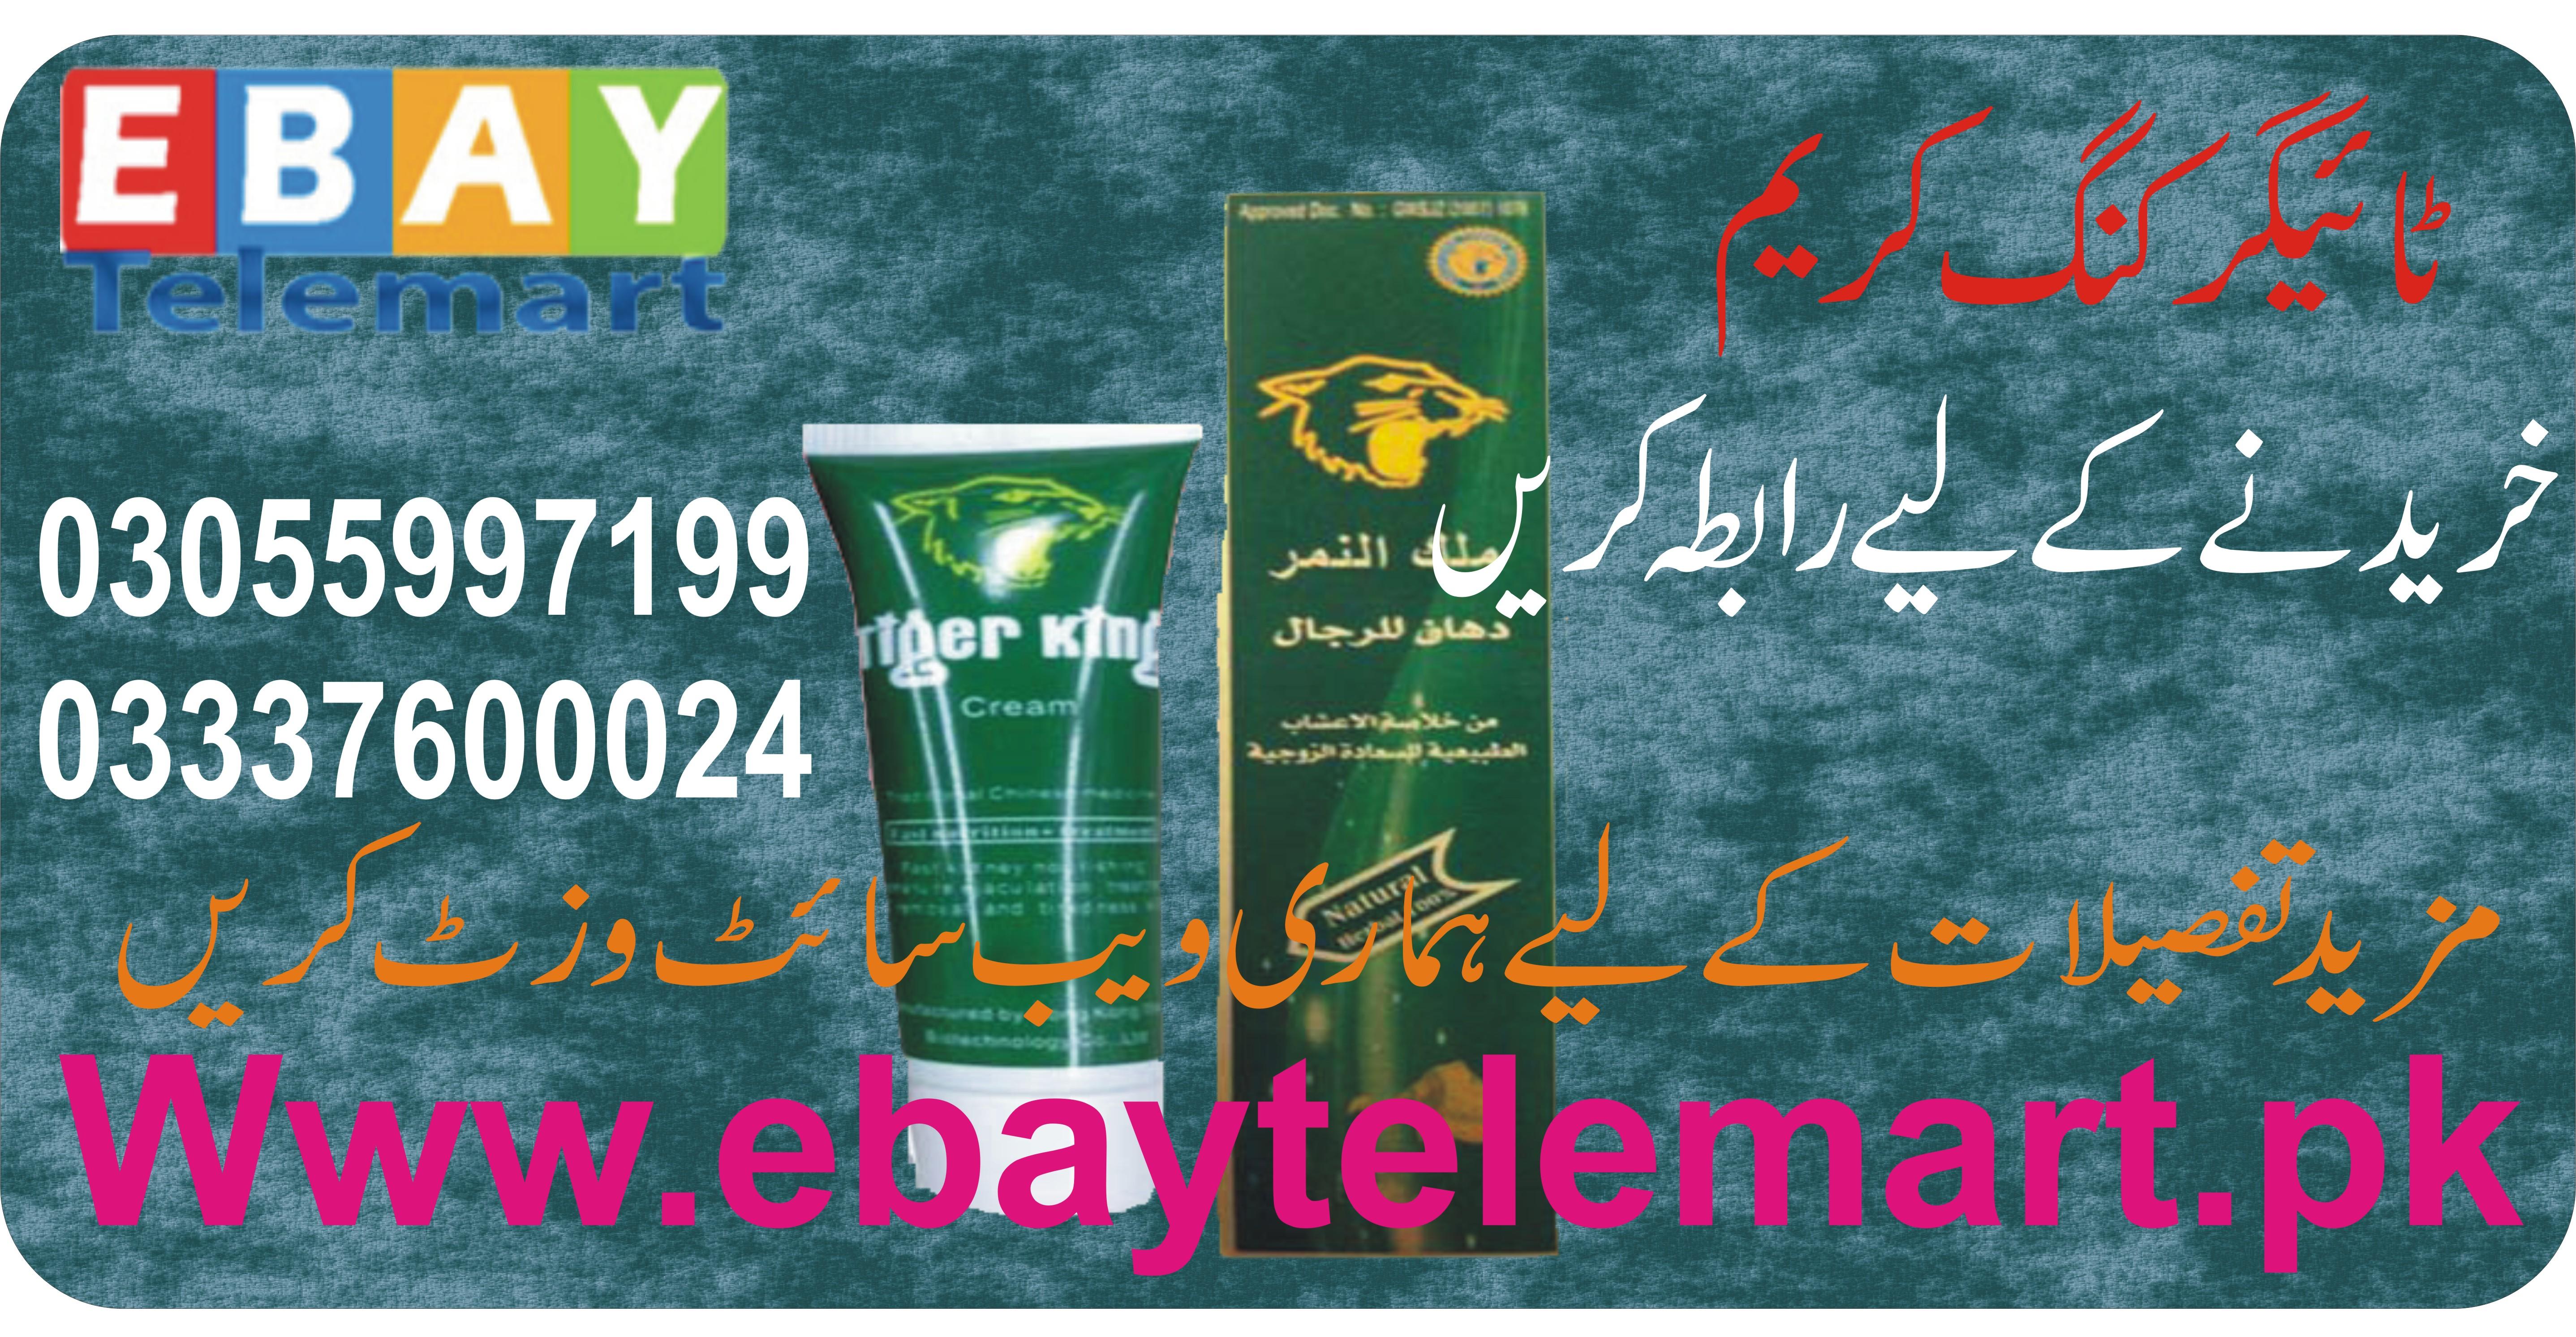 Tiger King Cream in Pakistan 03055997199